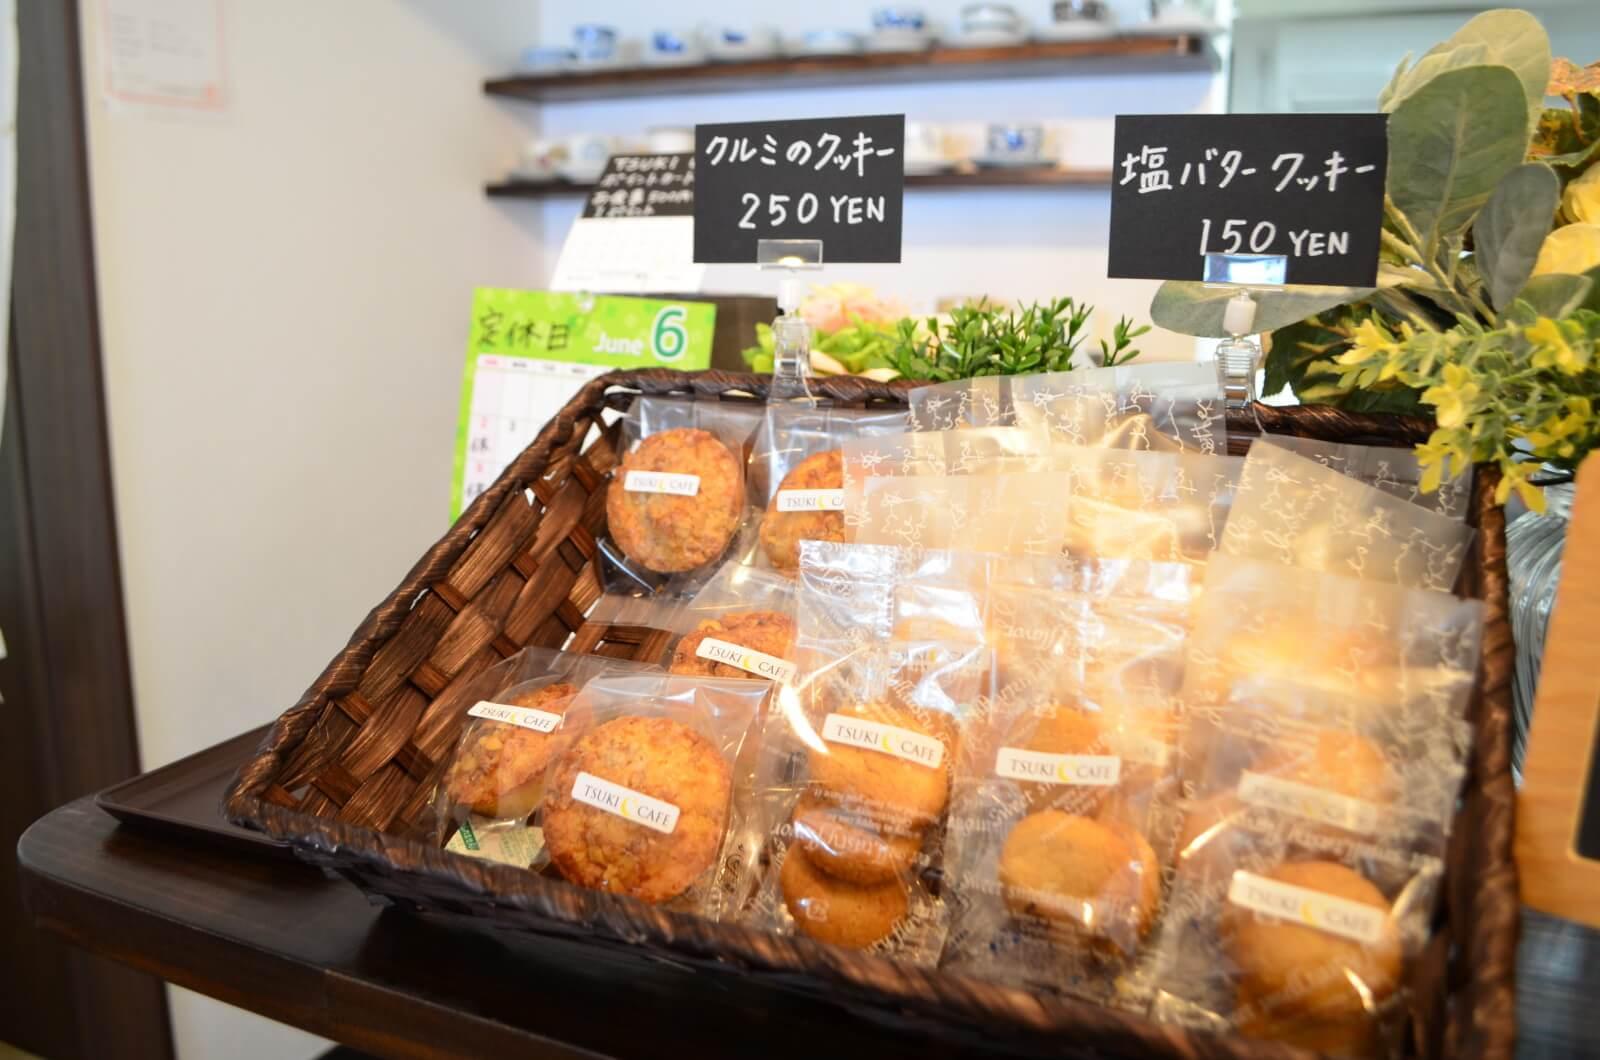 TSUKI CAFE 焼き菓子